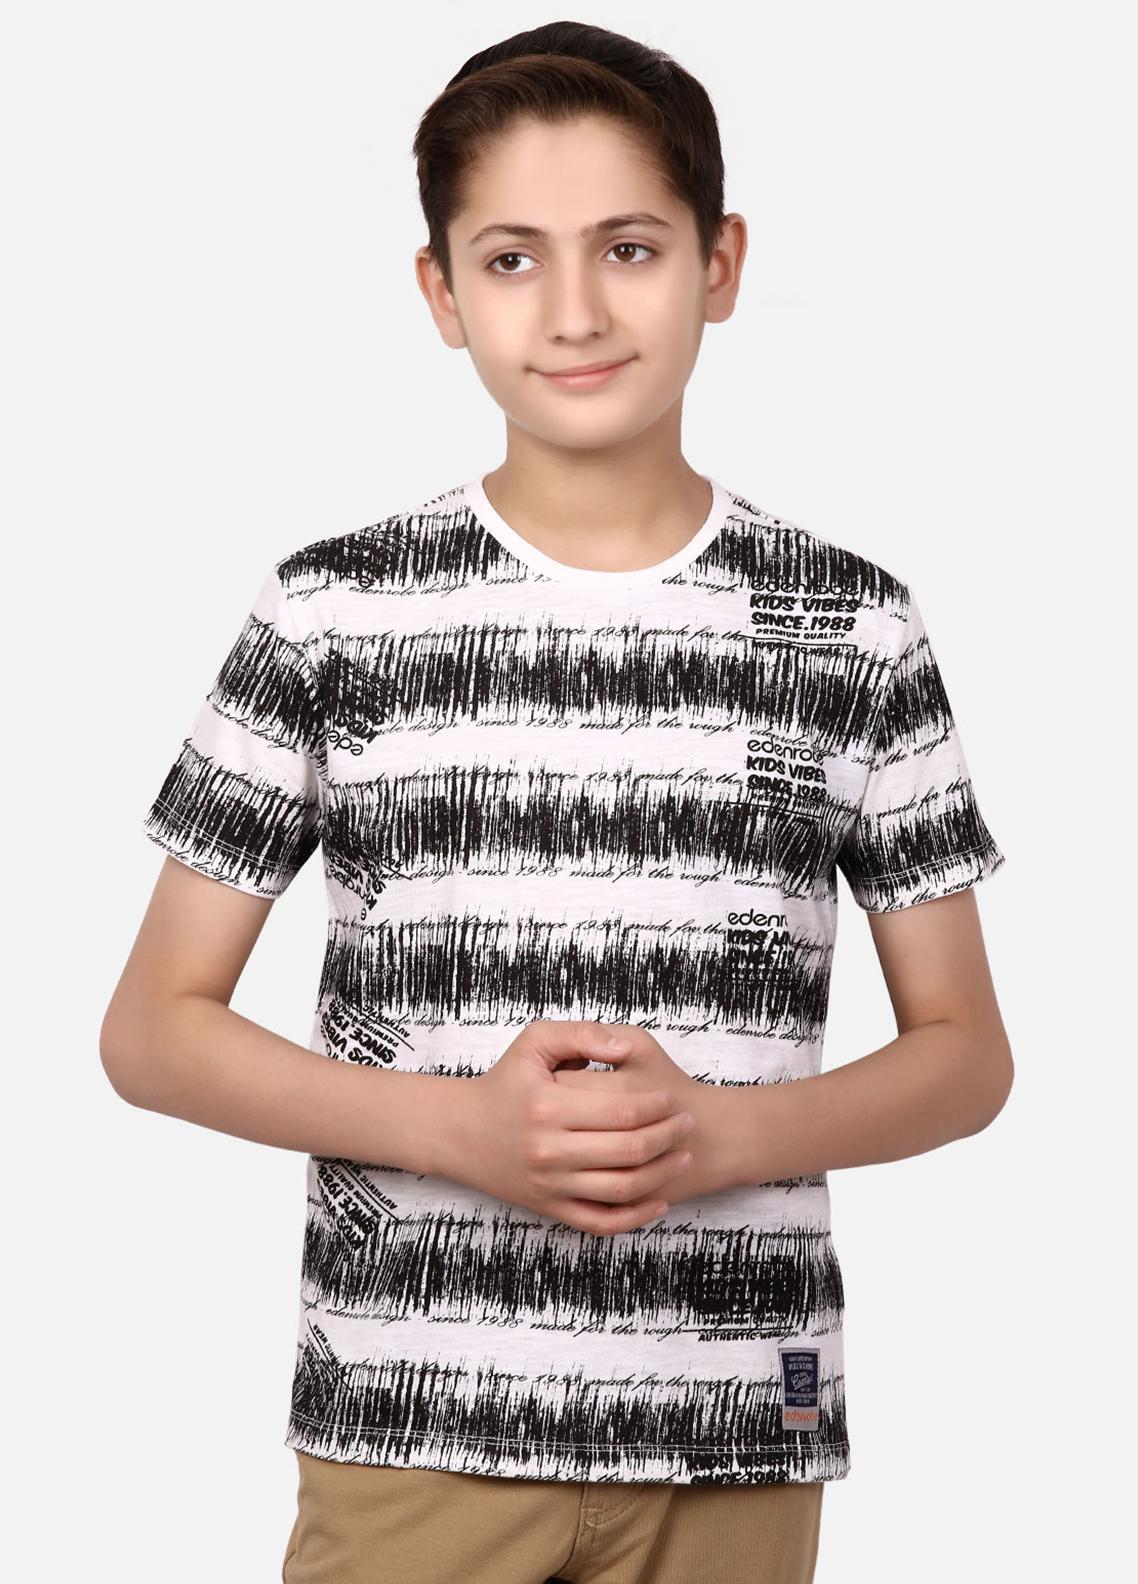 Edenrobe Cotton Half Sleeves Boys Tees - White EBTTS19-010